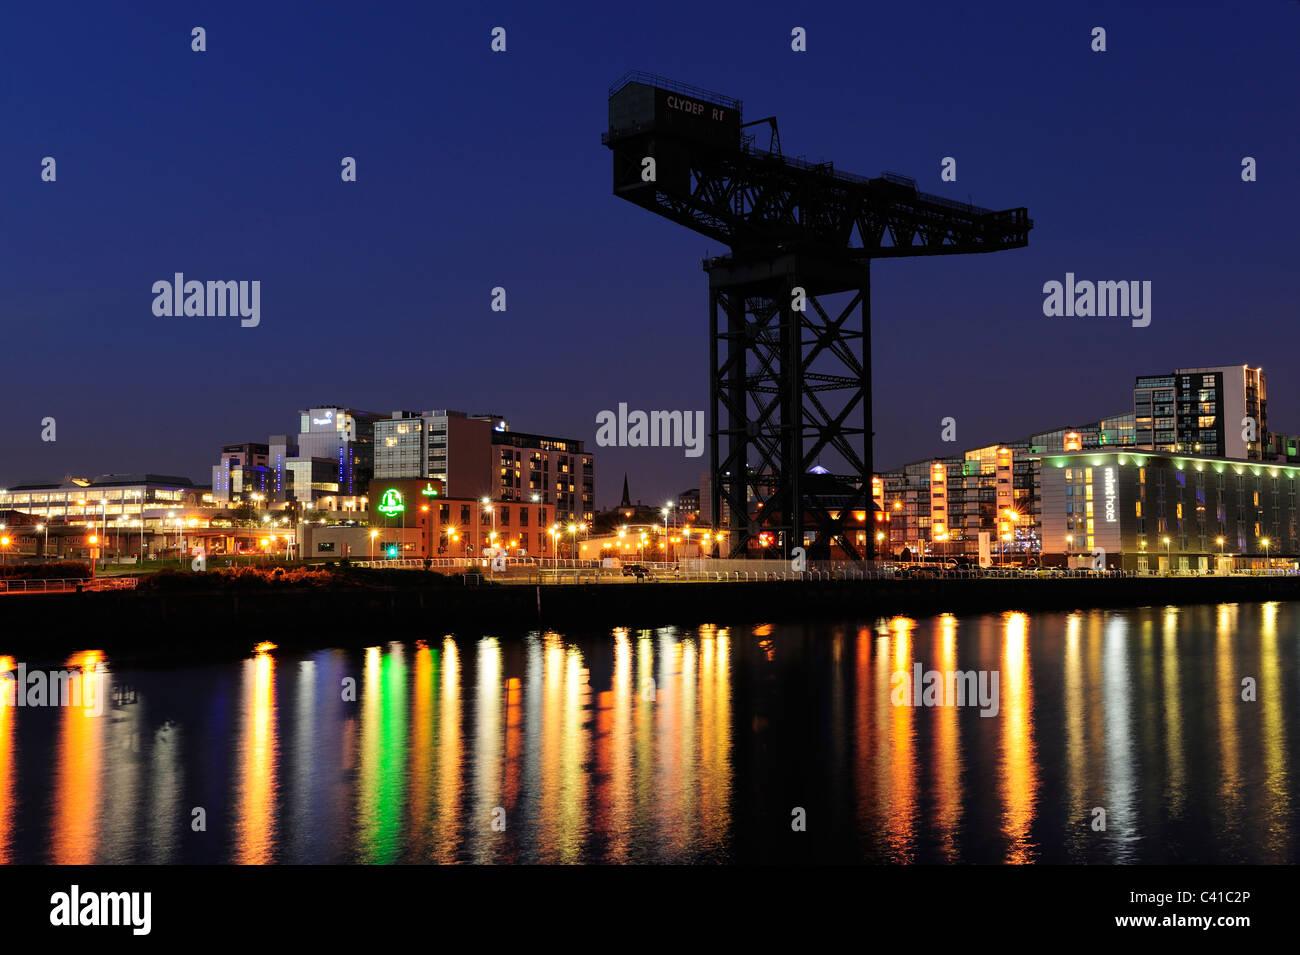 Finnieston Crane at night, Glasgow, Scotland - Stock Image